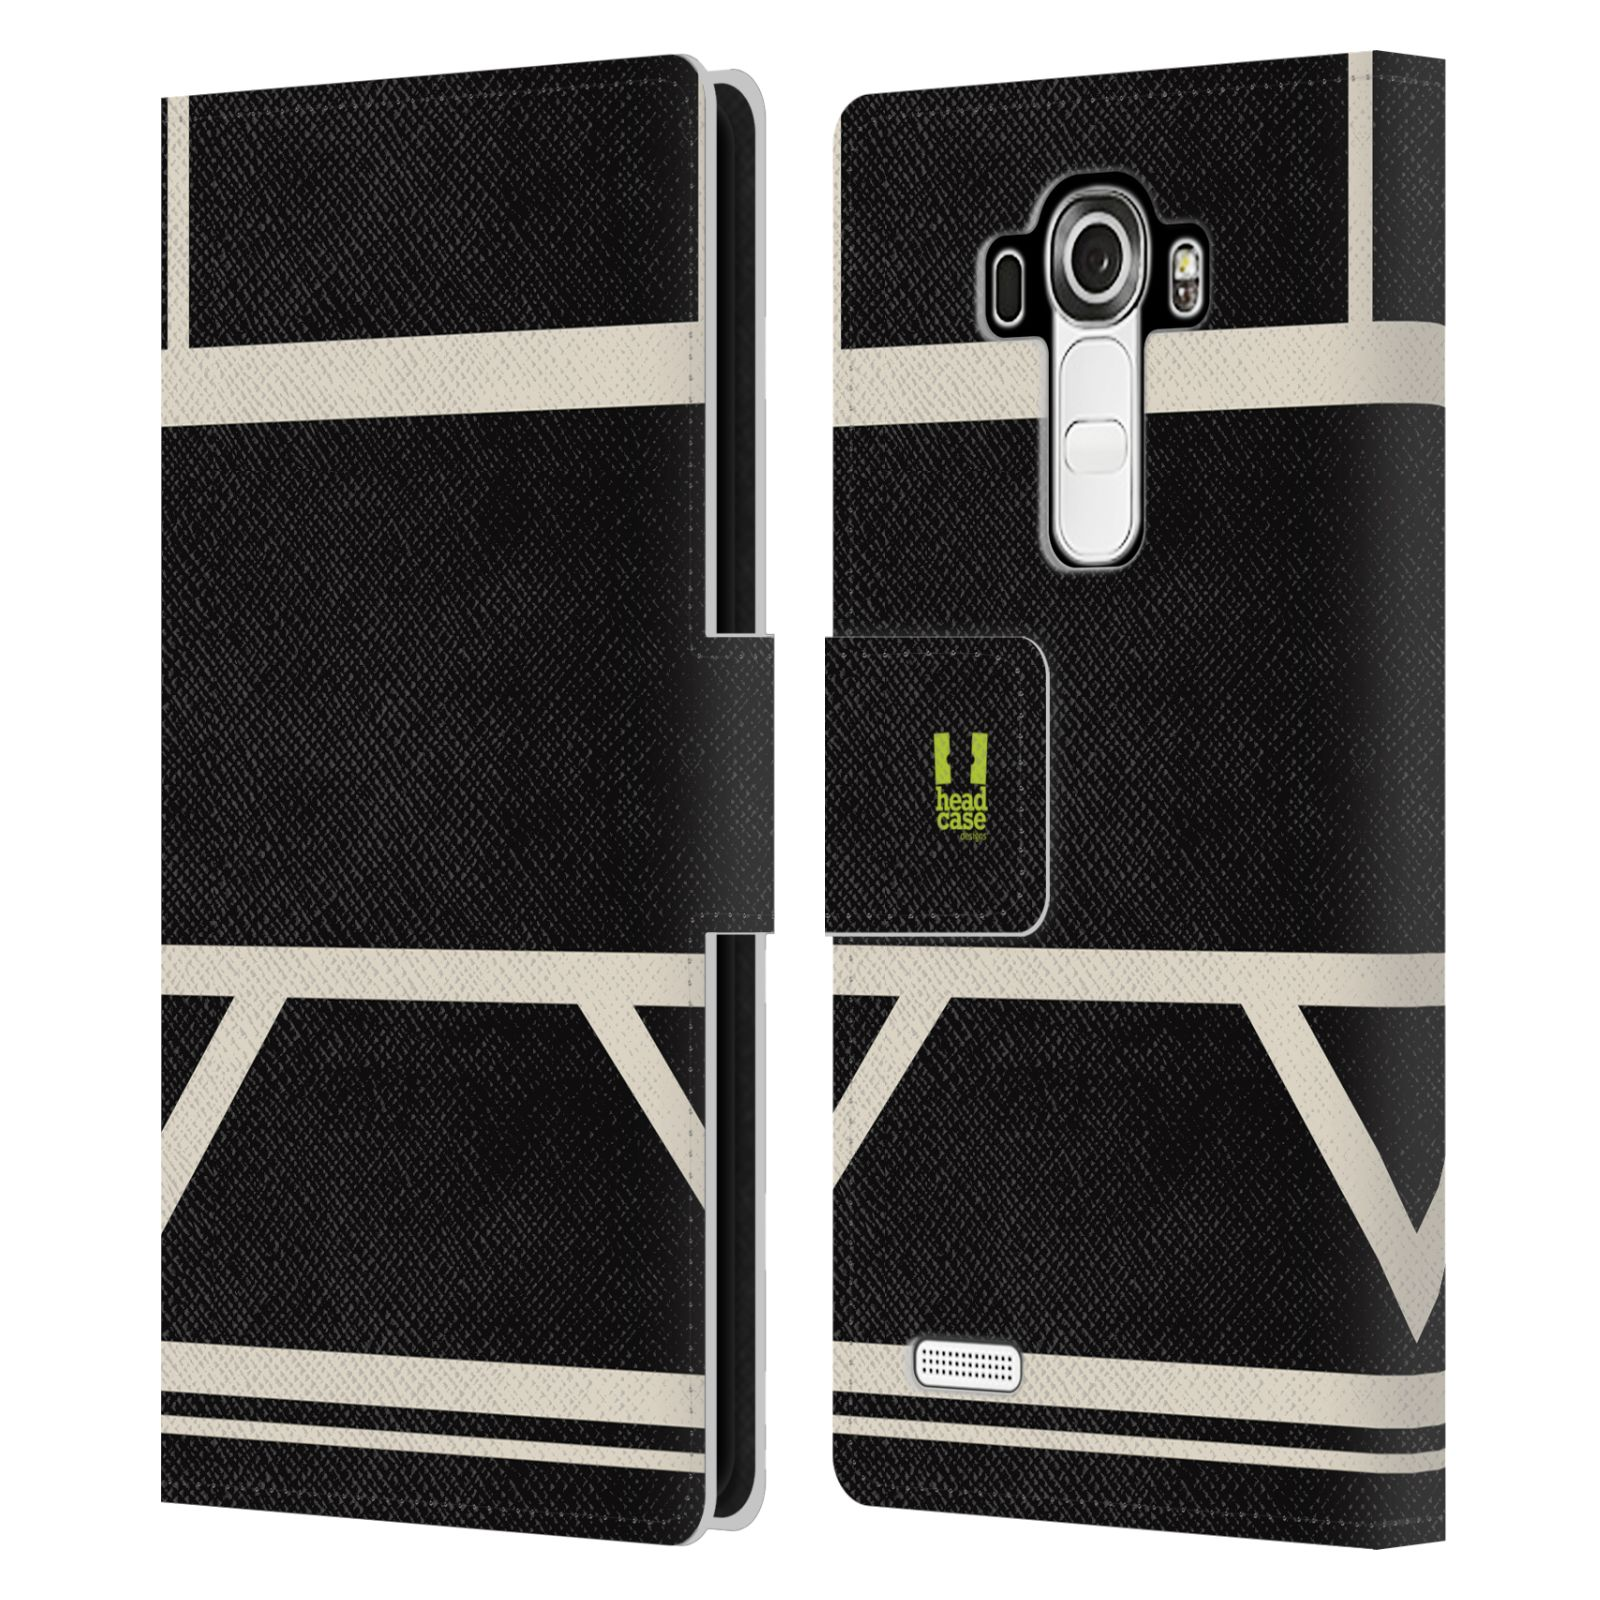 HEAD CASE Flipové pouzdro pro mobil LG G4 barevné tvary černá a bílá proužek